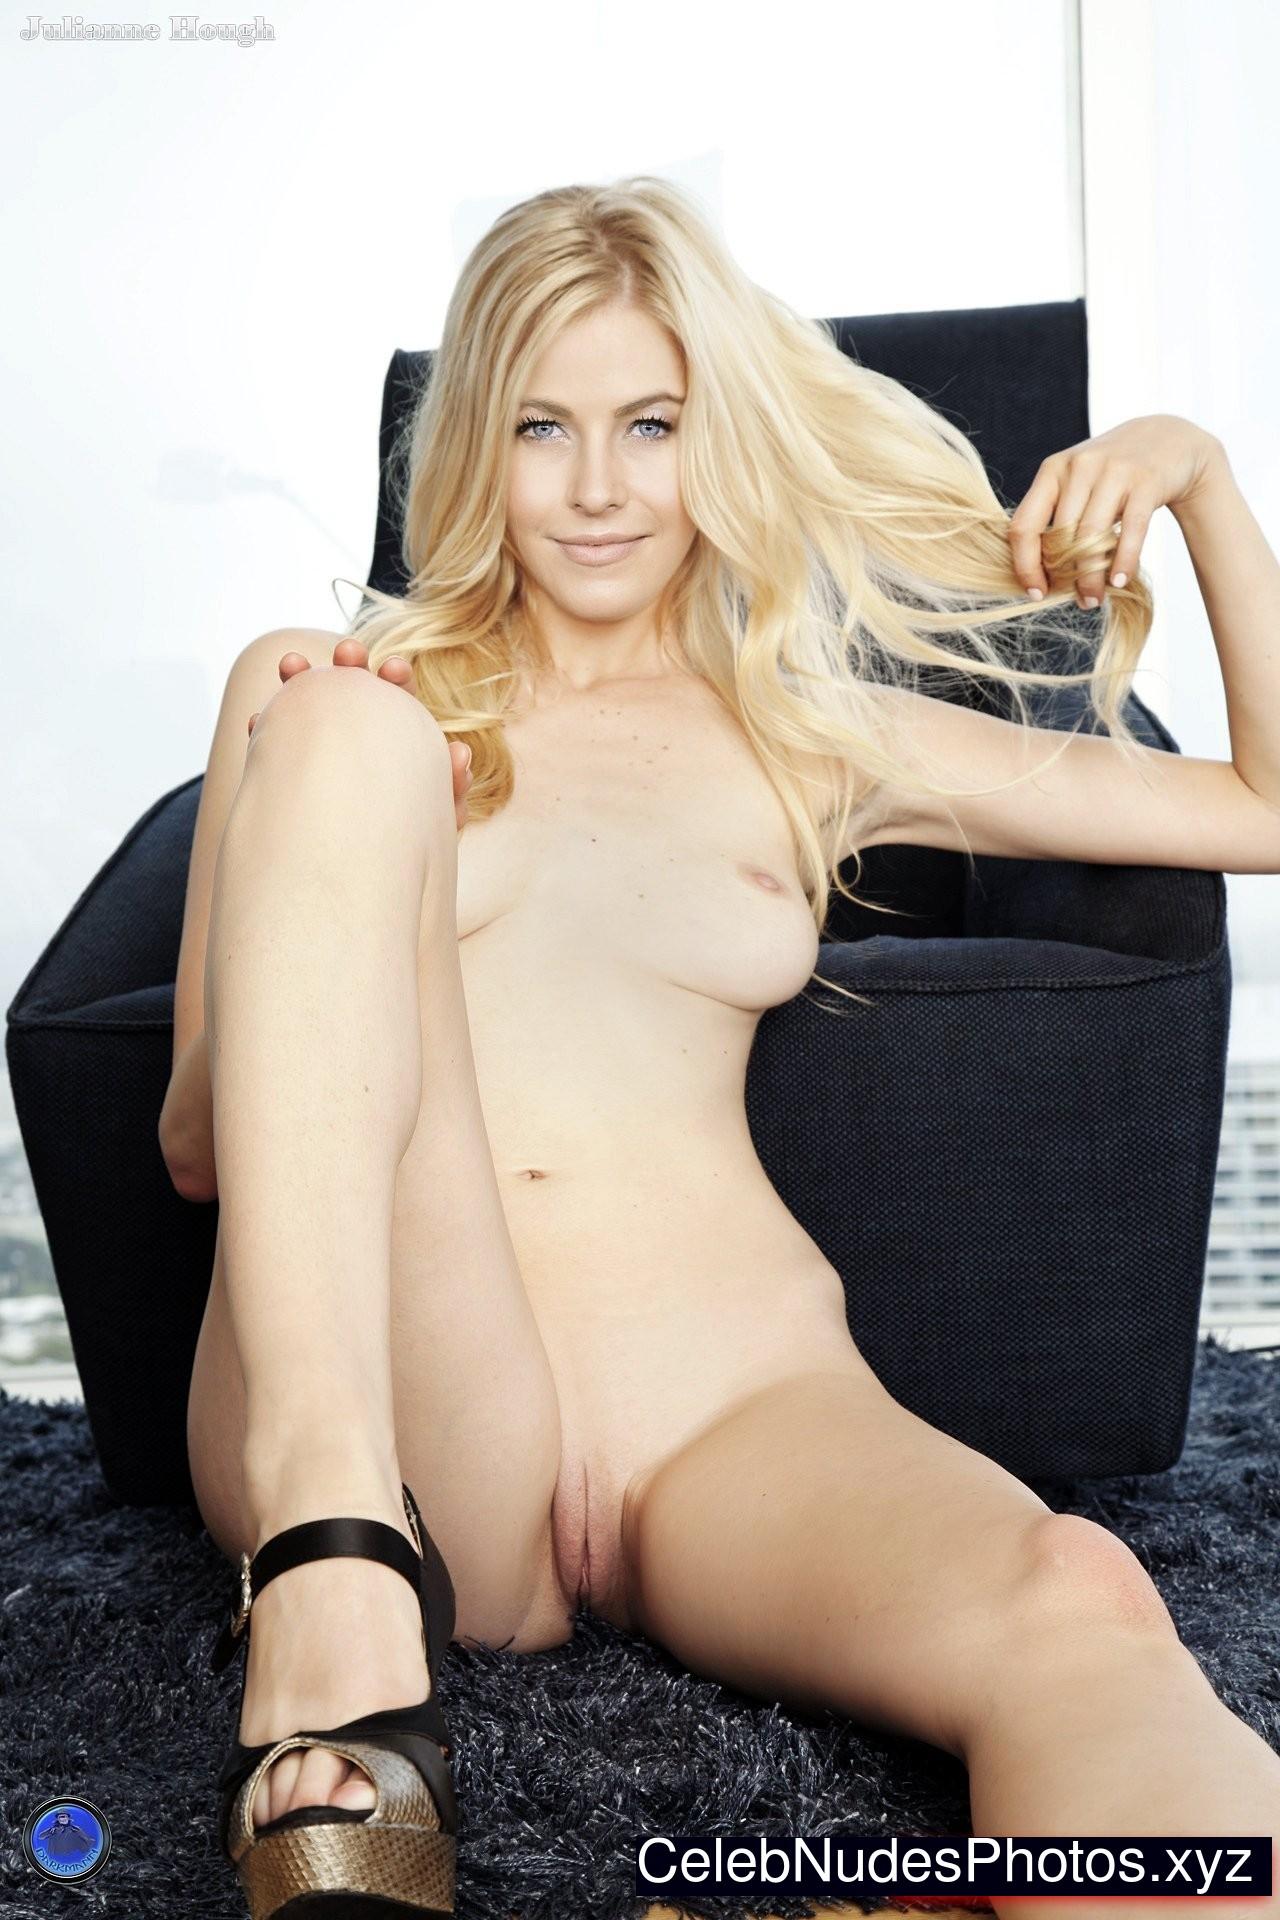 Speaking, Julianne hough naked correctly